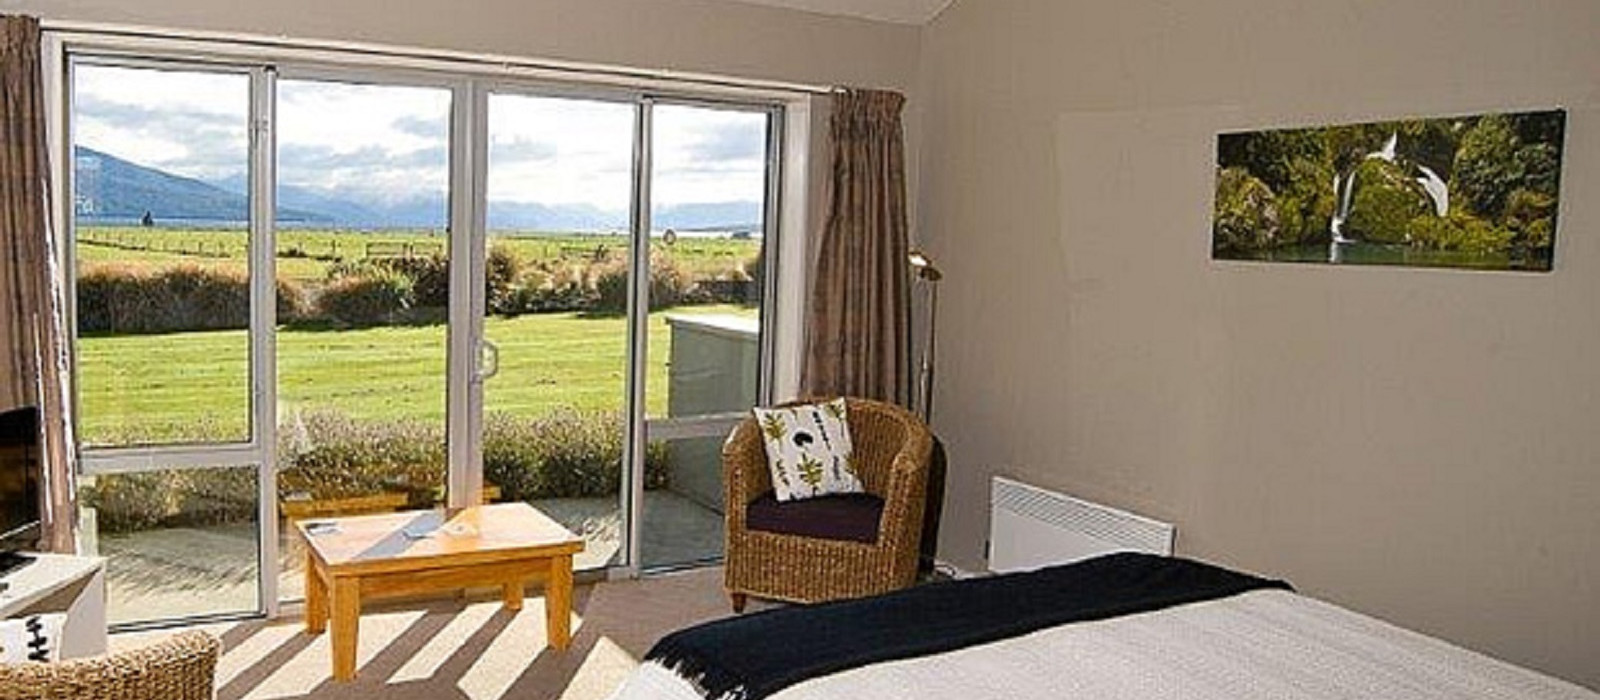 Hotel Dunluce Bed & Breakfast New Zealand